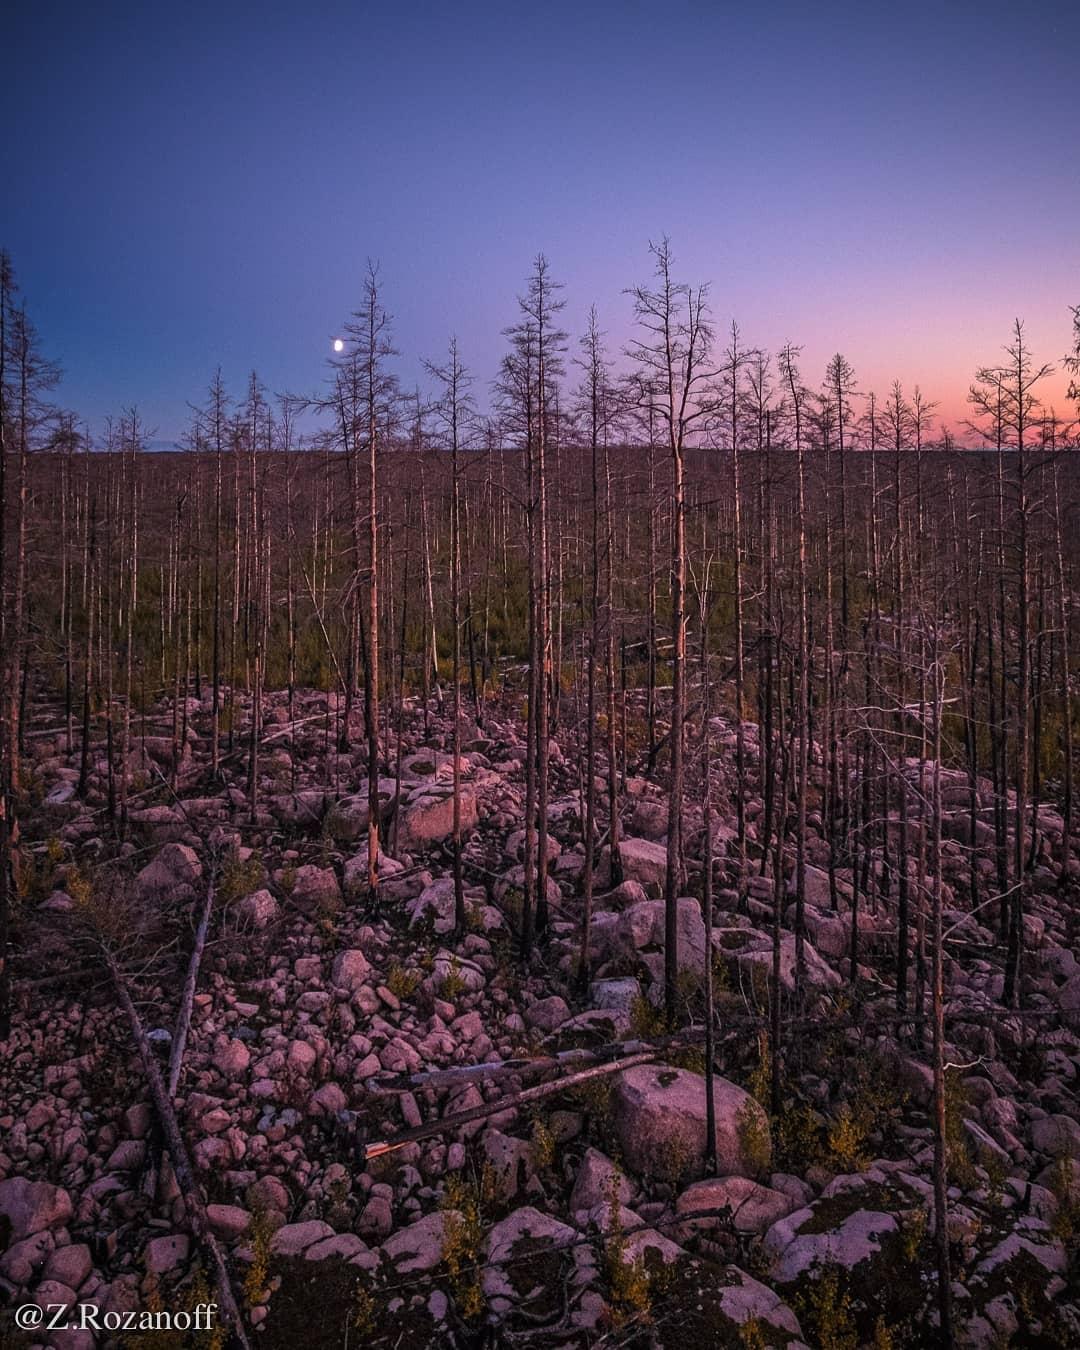 Hälleskogsbrännans Naturreservat